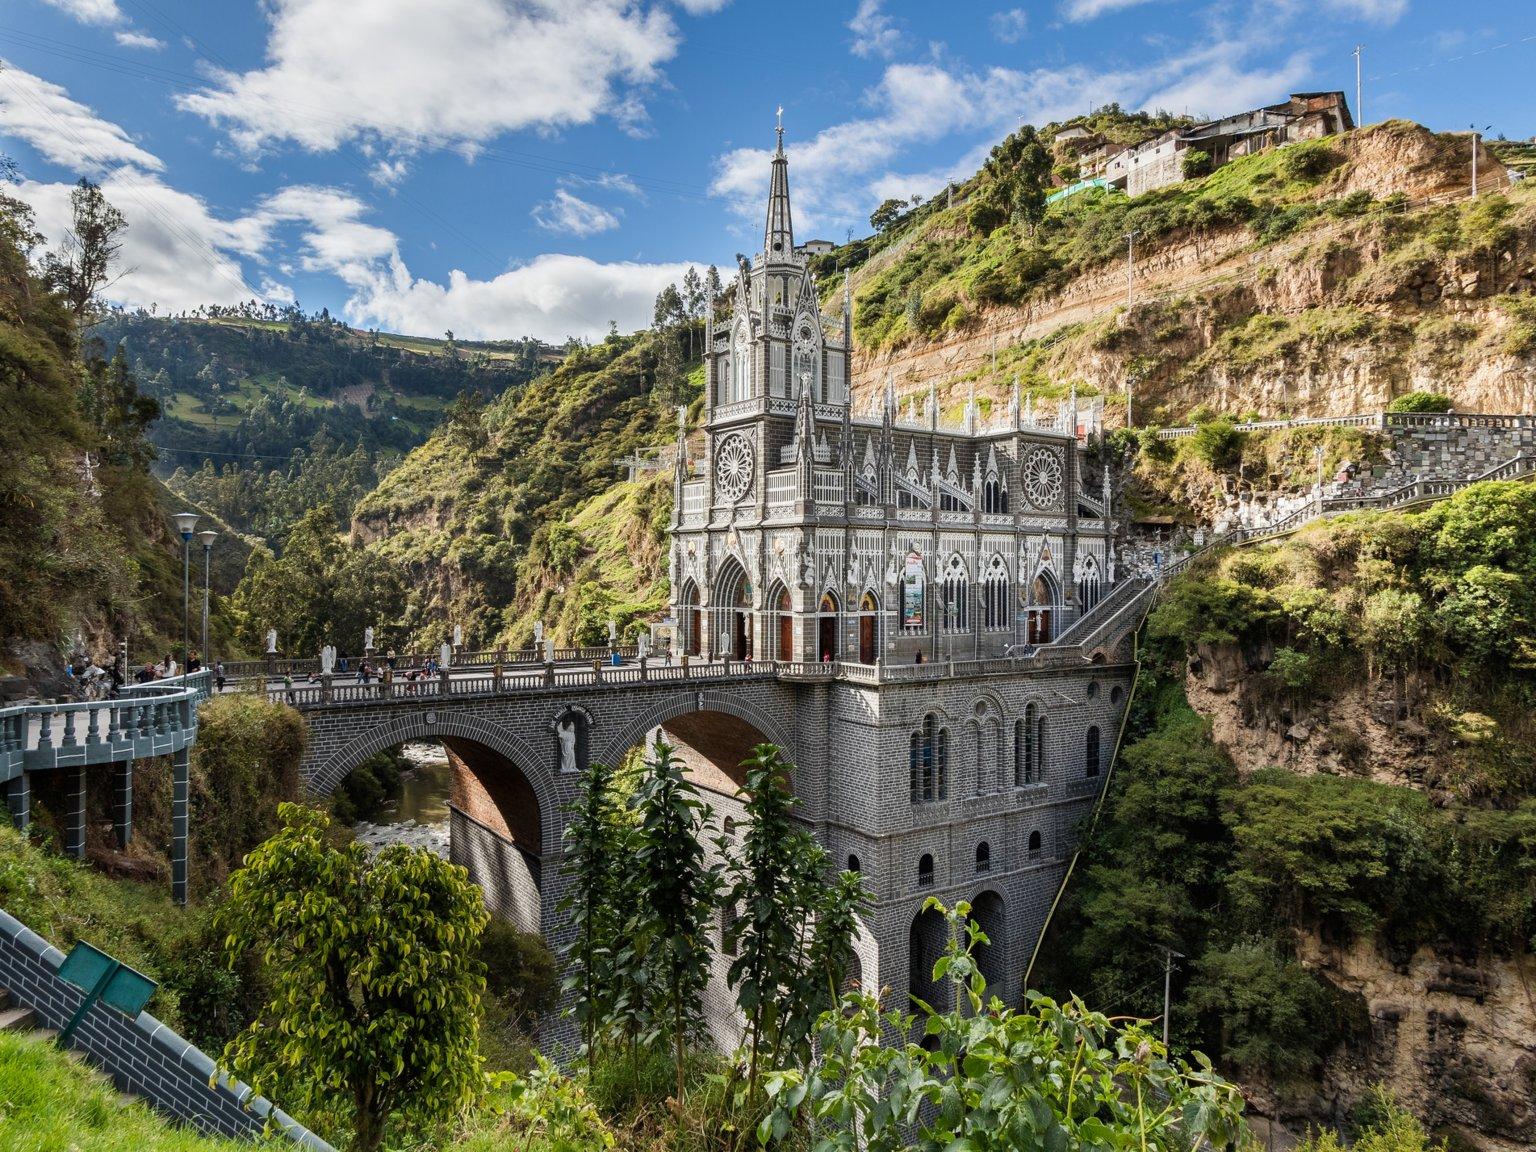 5. Khu bảo tồn Las Lajas ở Narino, Colombia